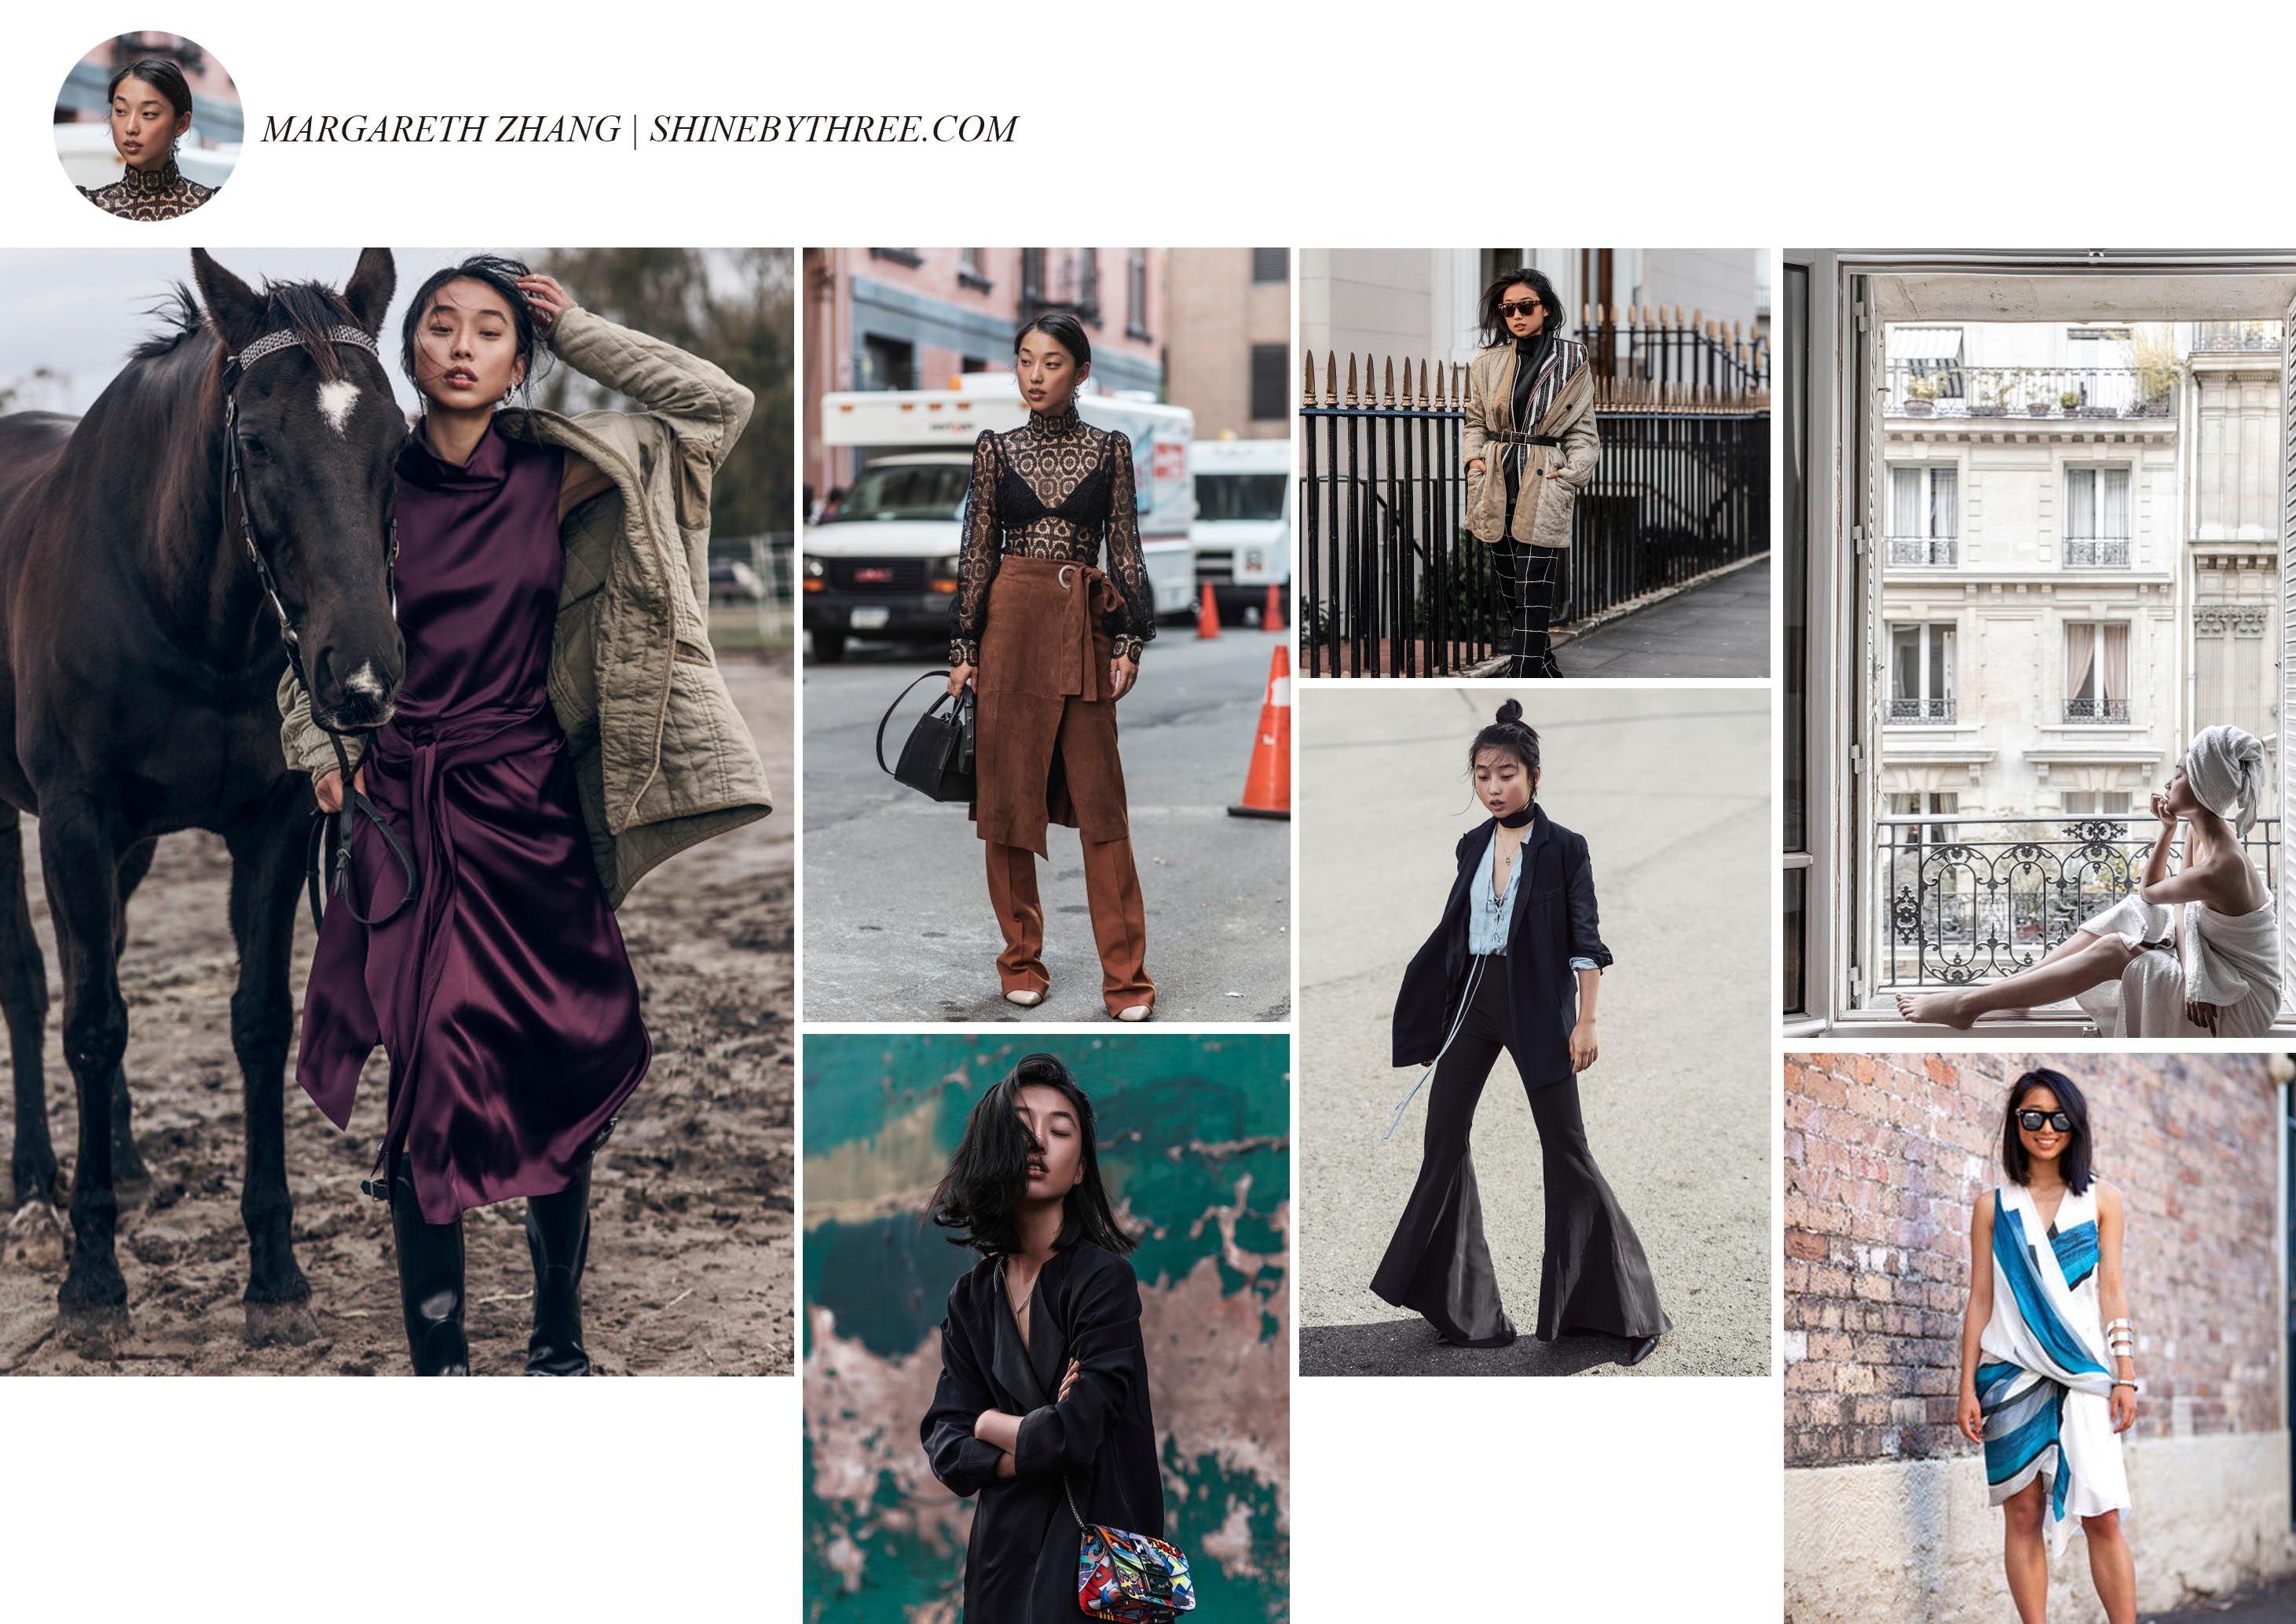 top-10-blogger-margarethzhang-shinebythreecom-2-b22ec573fe45a1dfa84f7dc0efb57265.jpg